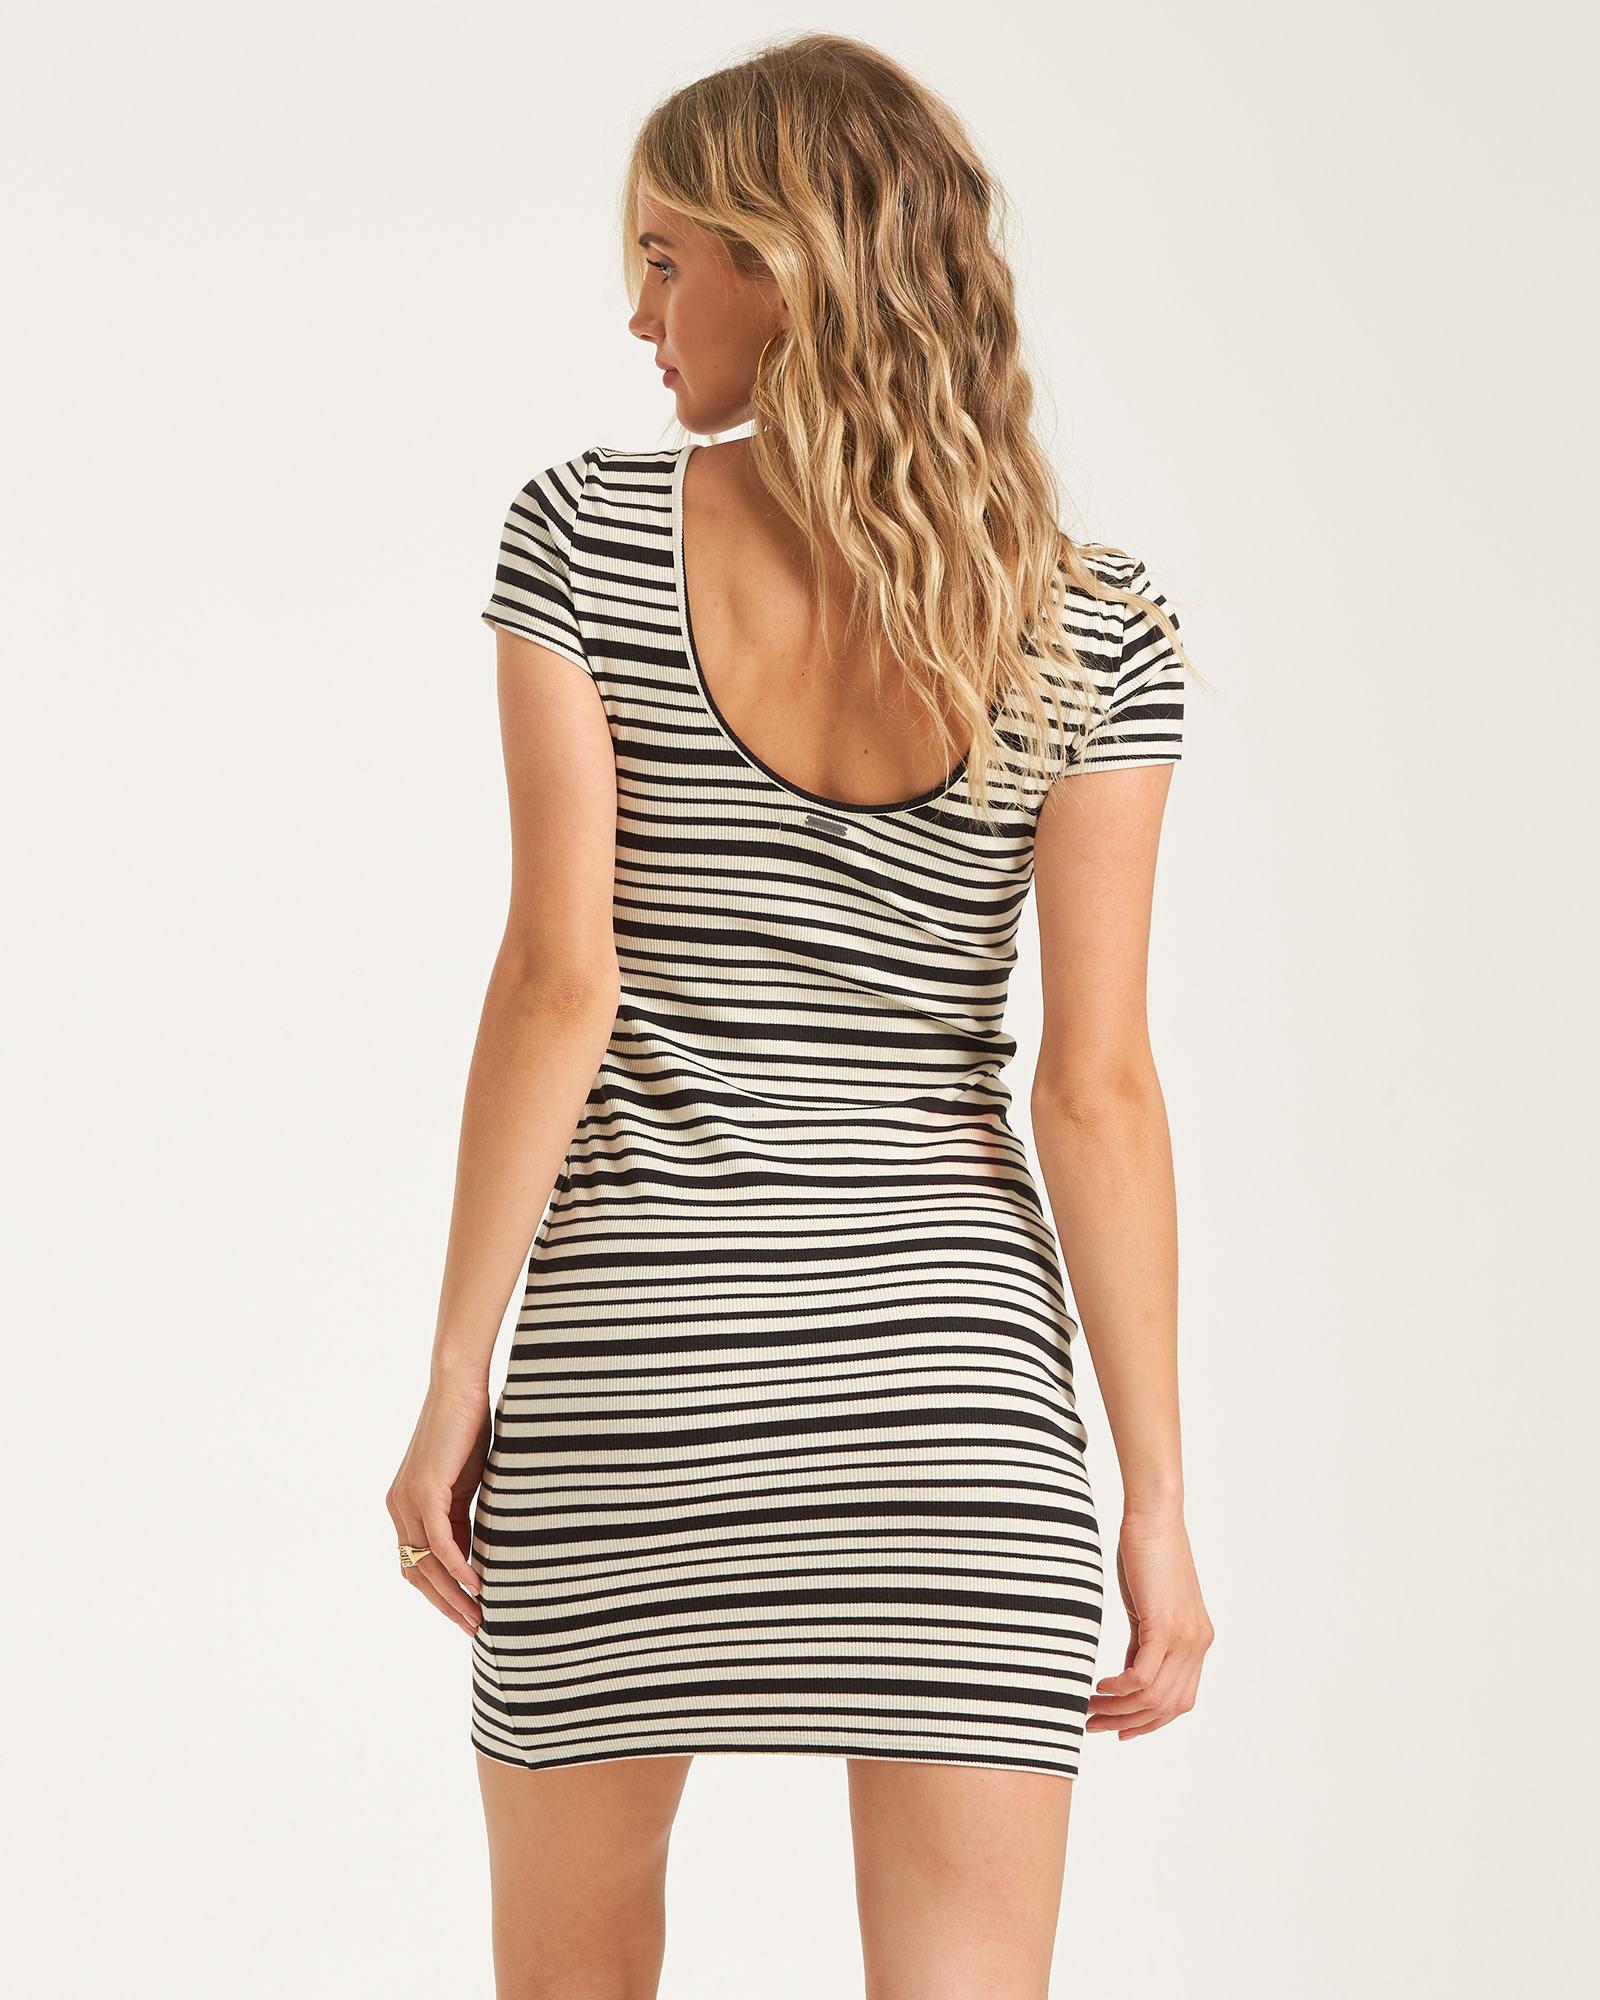 SHORE THING DRESS-2